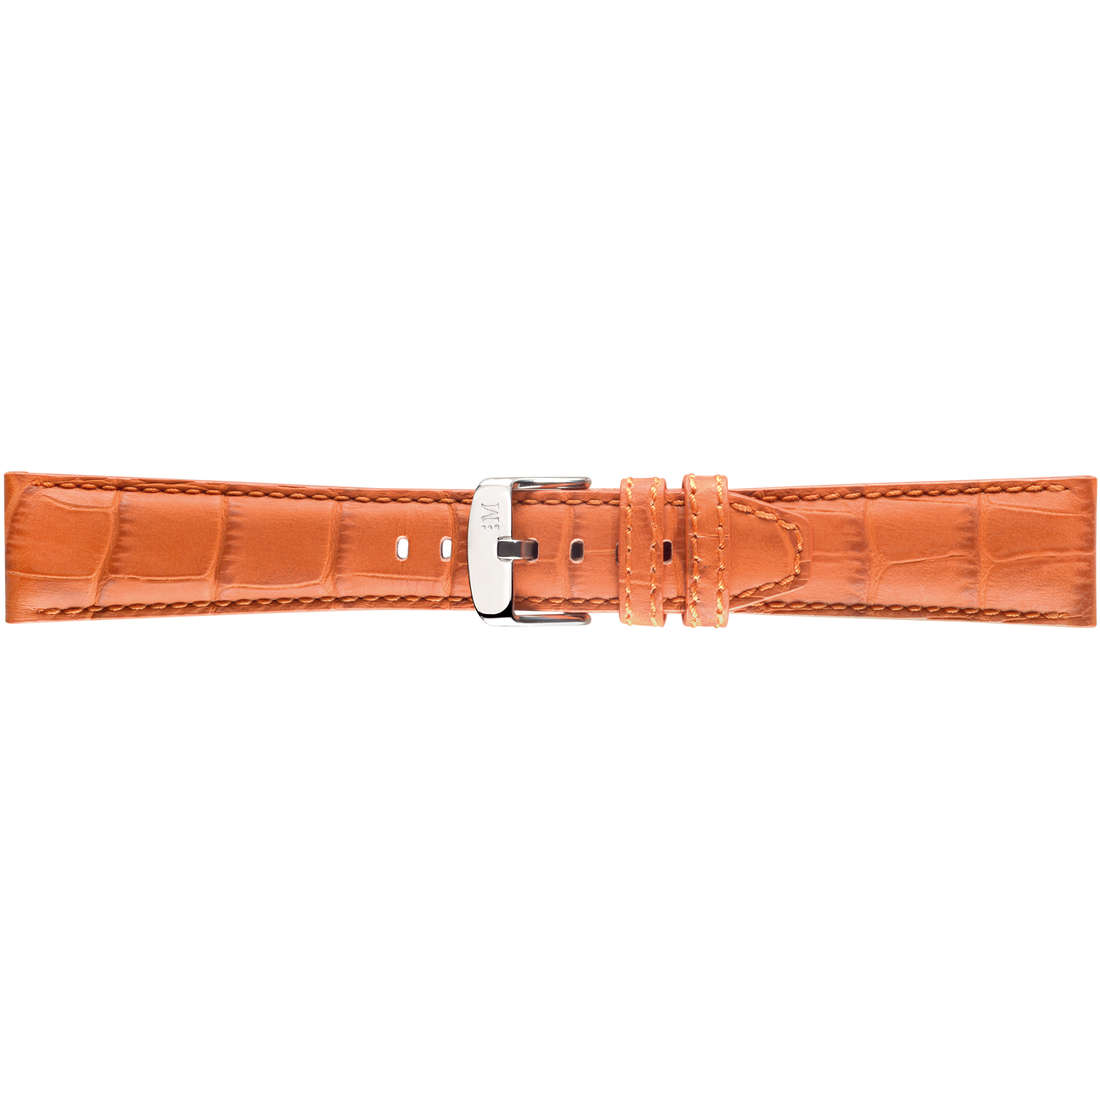 montre bande de montres homme Morellato Linea Sport A01X4497B44086CR22